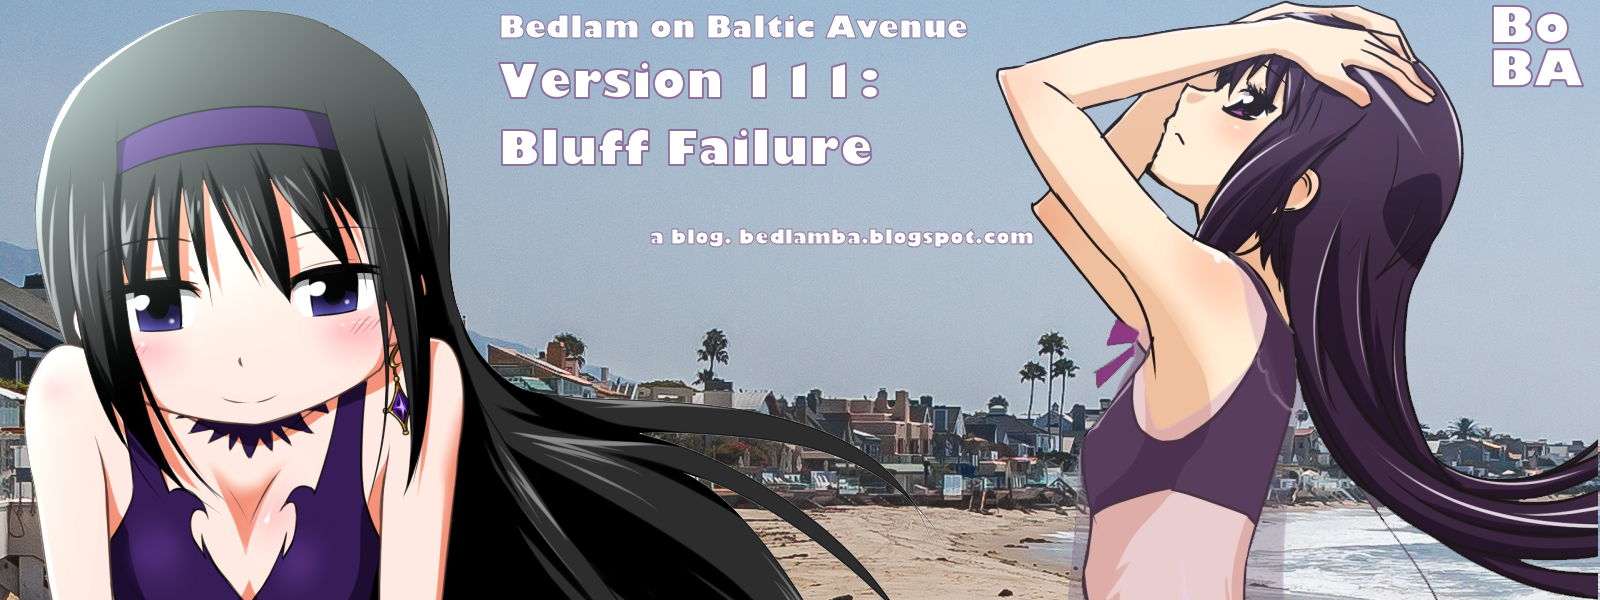 Bedlam on Baltic Avenue